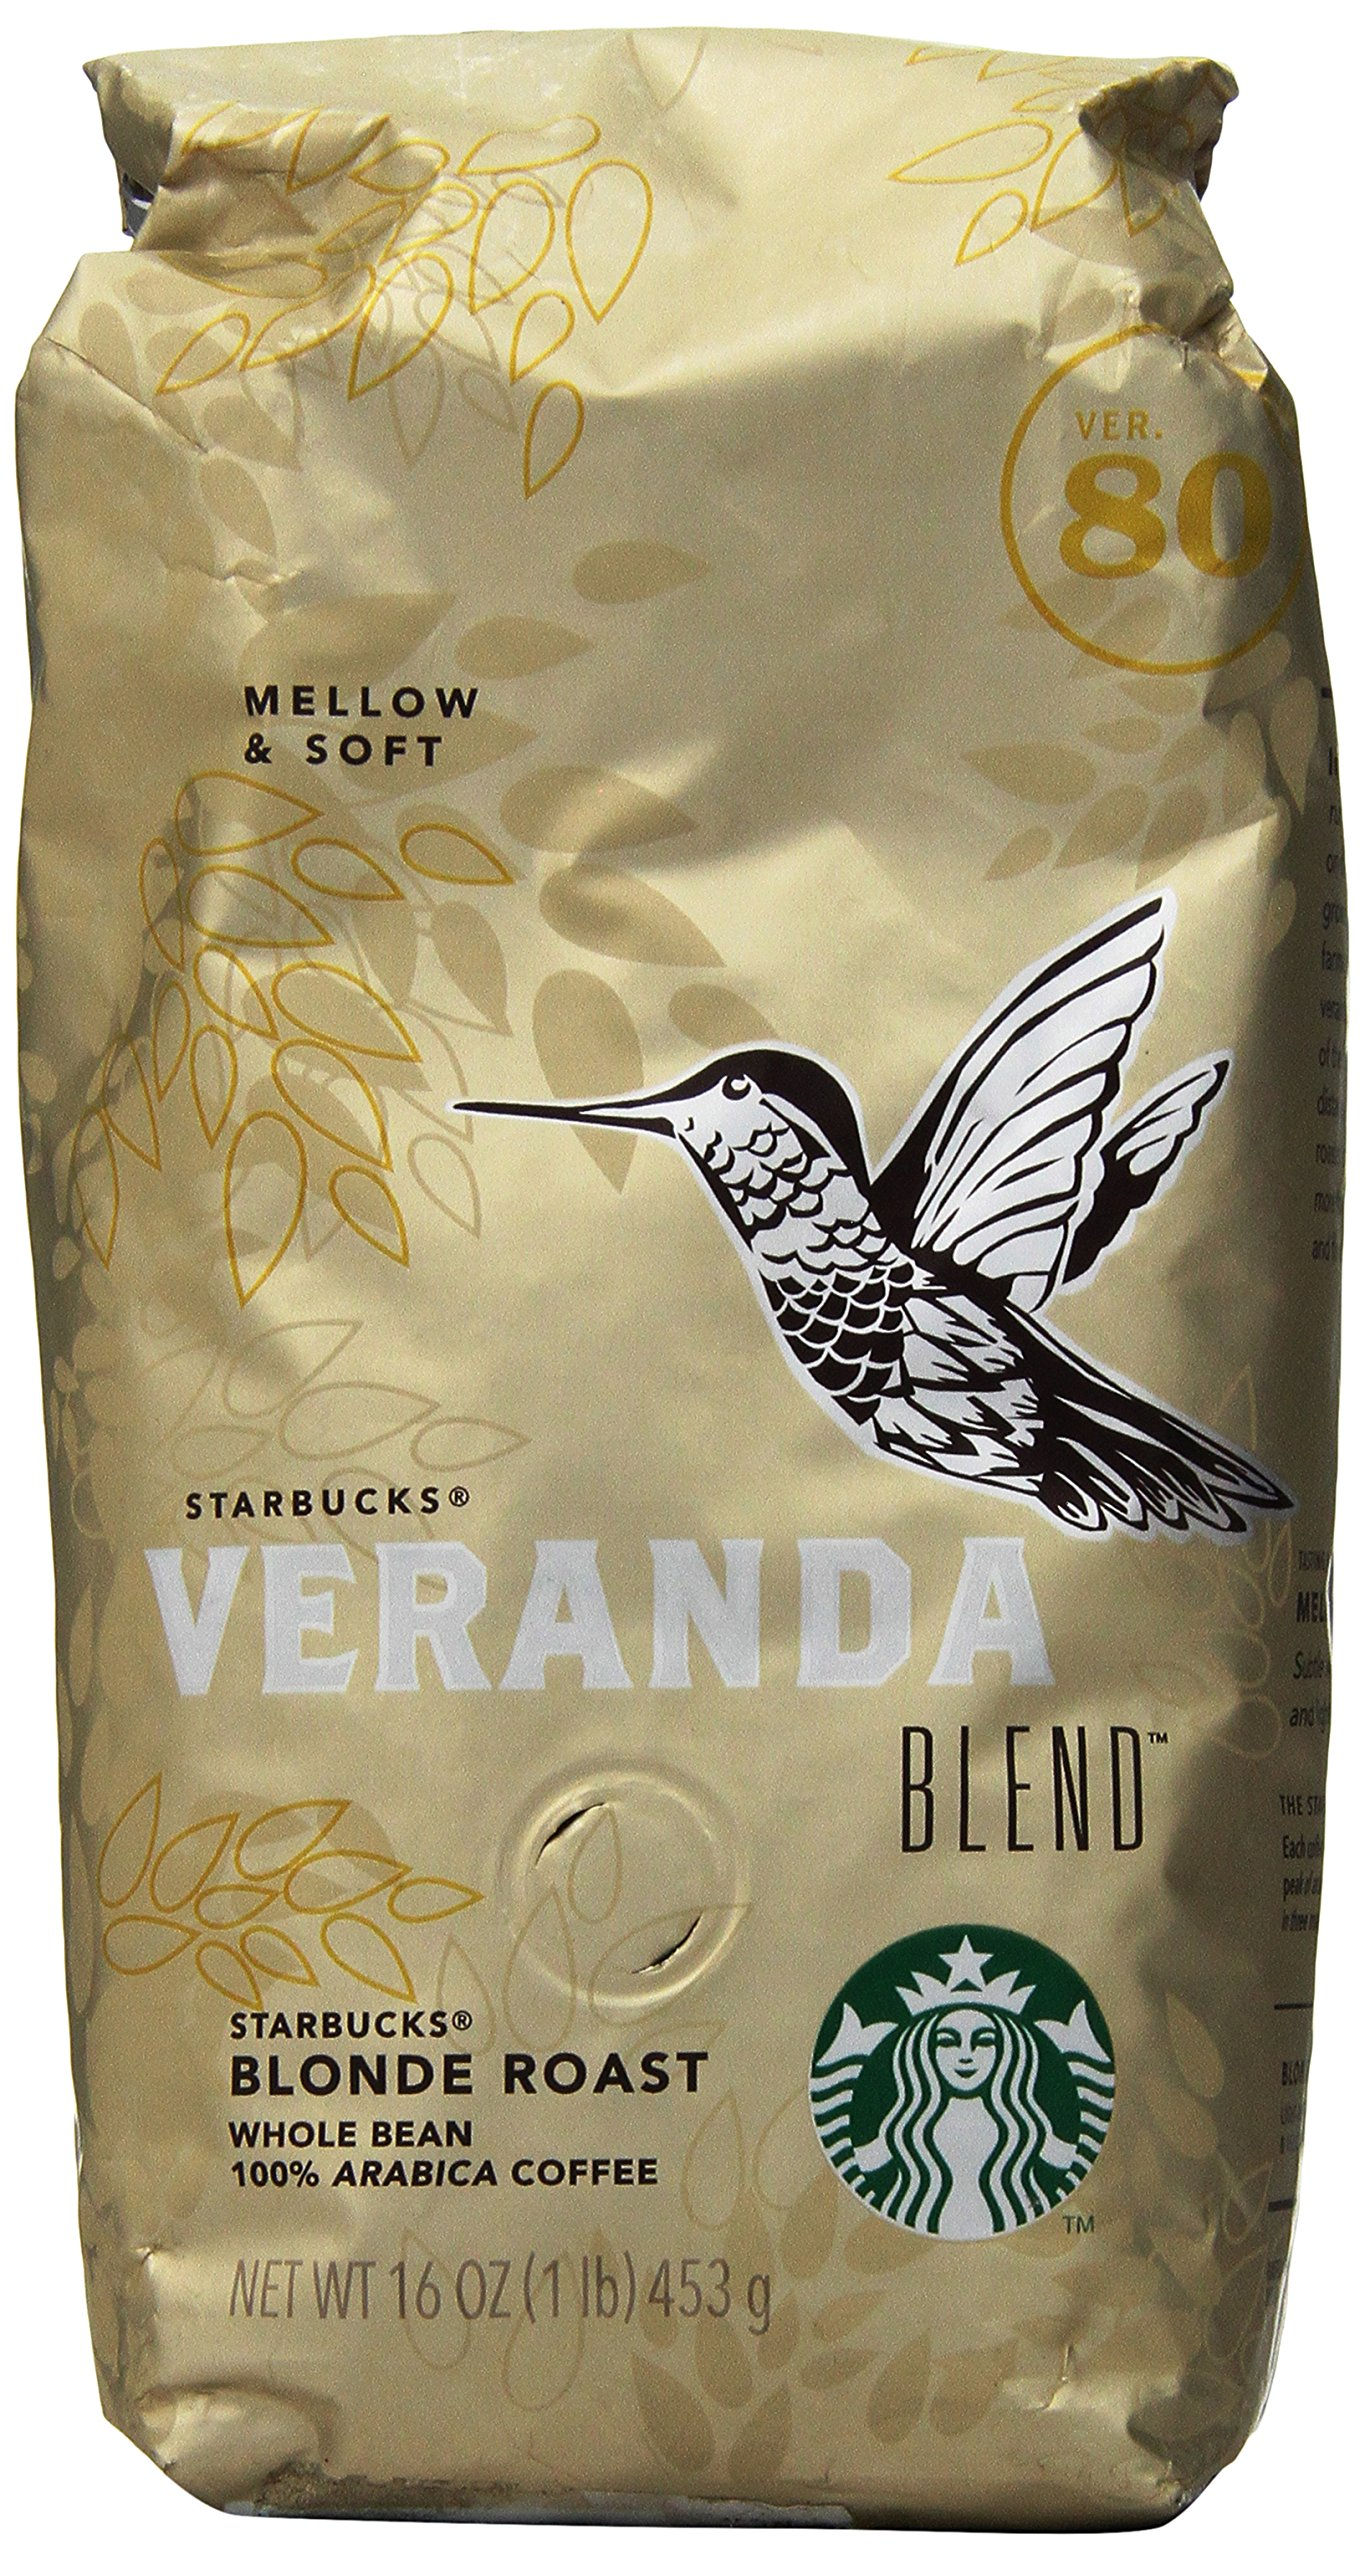 Starbucks Veranda Blendx2122; Whole Bean Coffee (1lb)